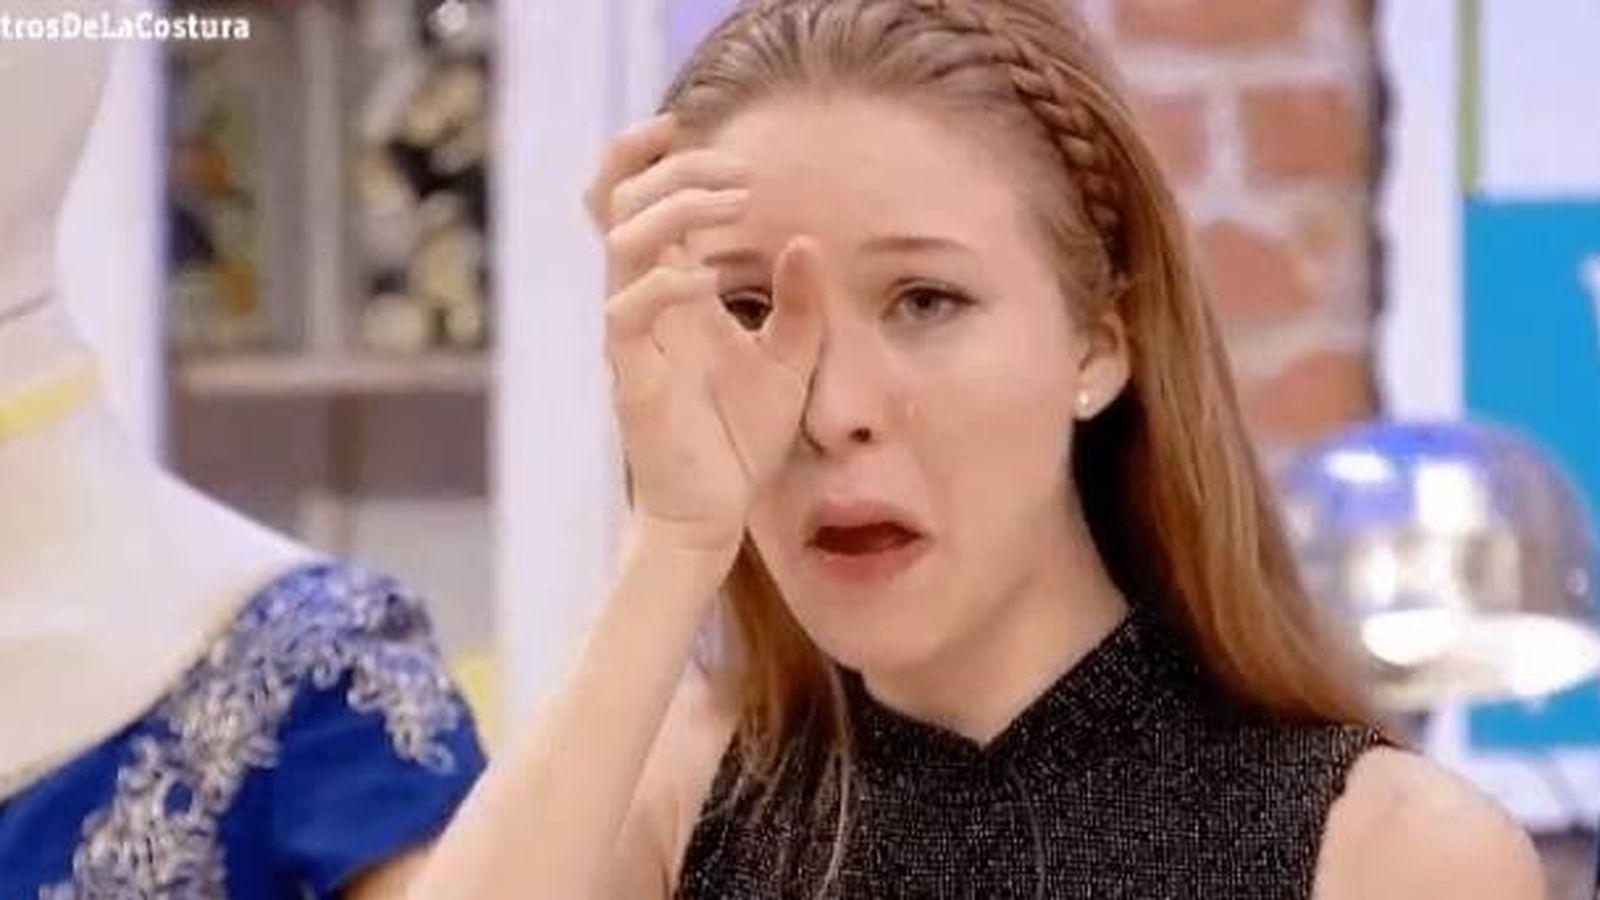 Foto: Alicia rompió a llorar al ver a su madre en el taller de 'Maestros de la costura'